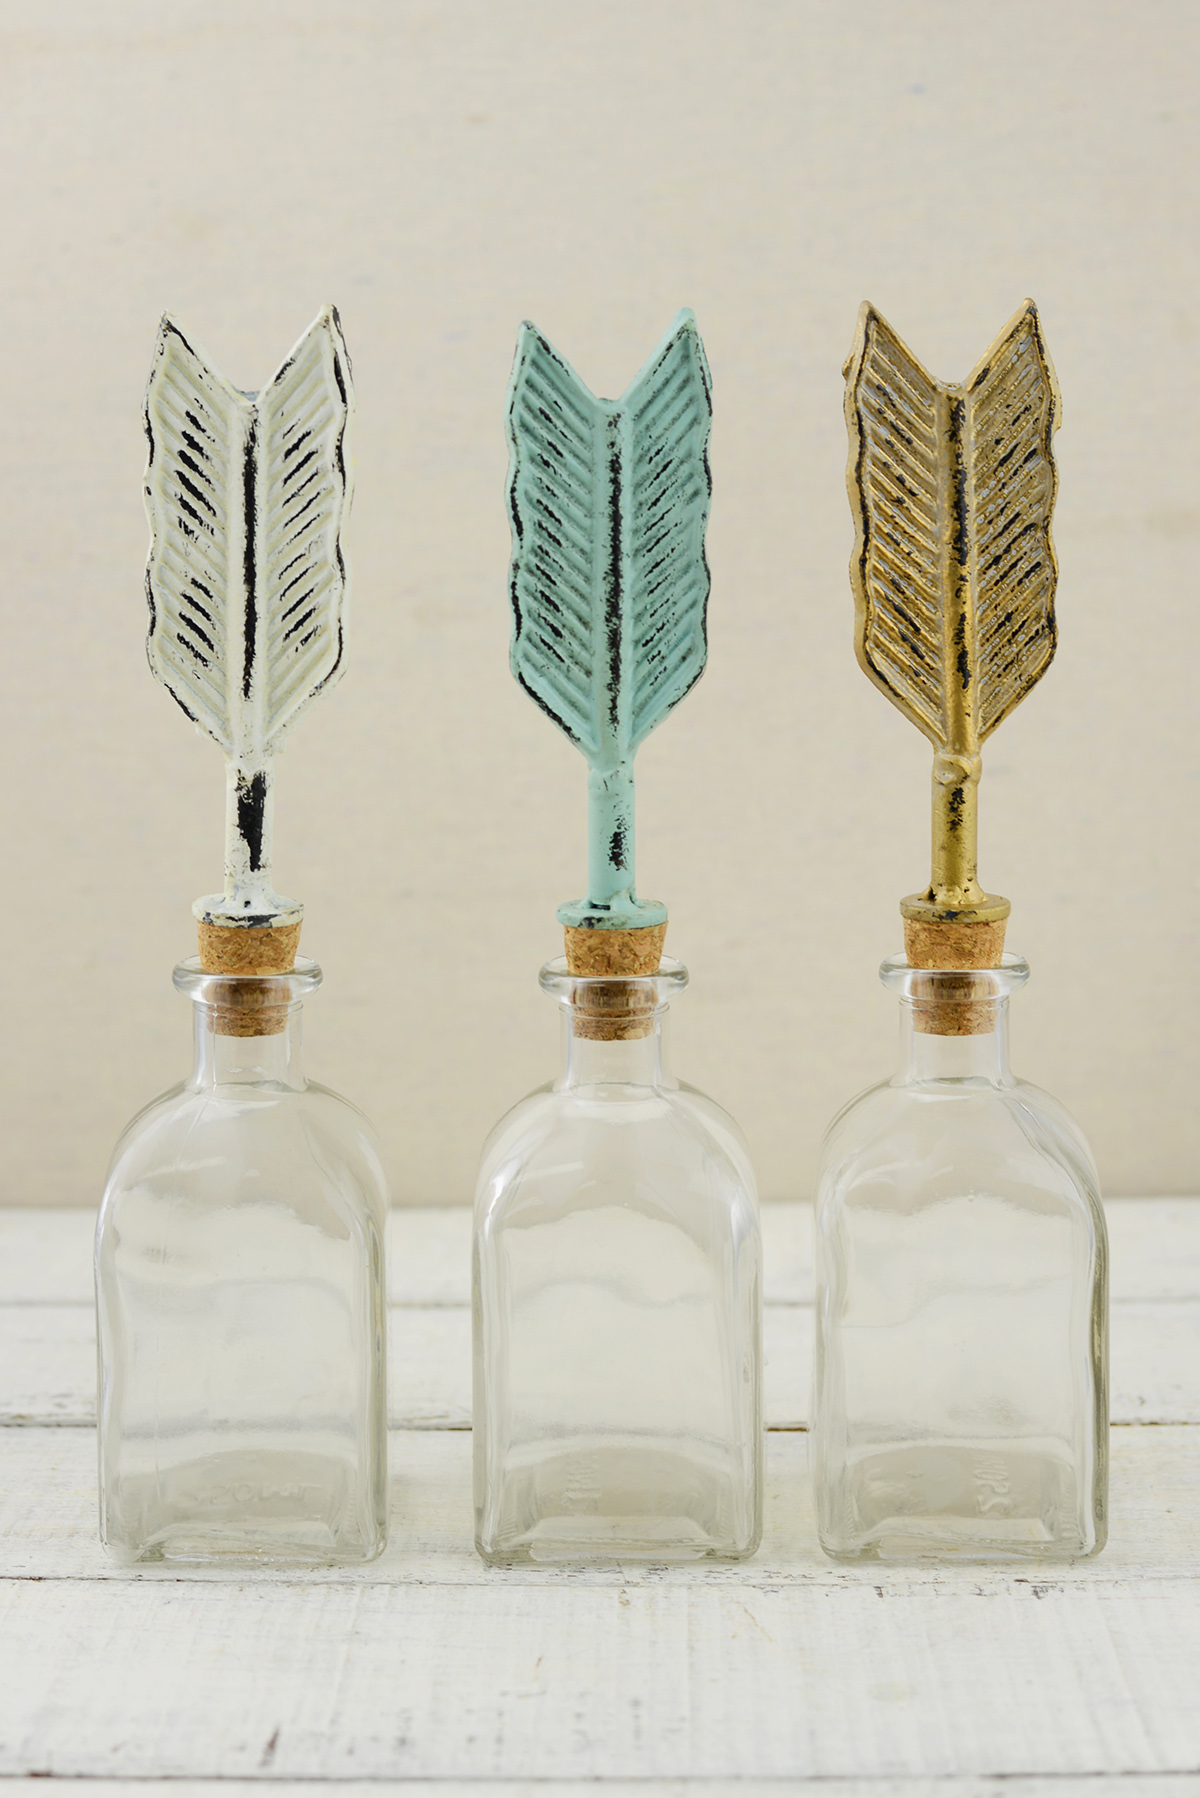 3 Decorative Arrow Glass Bottles by